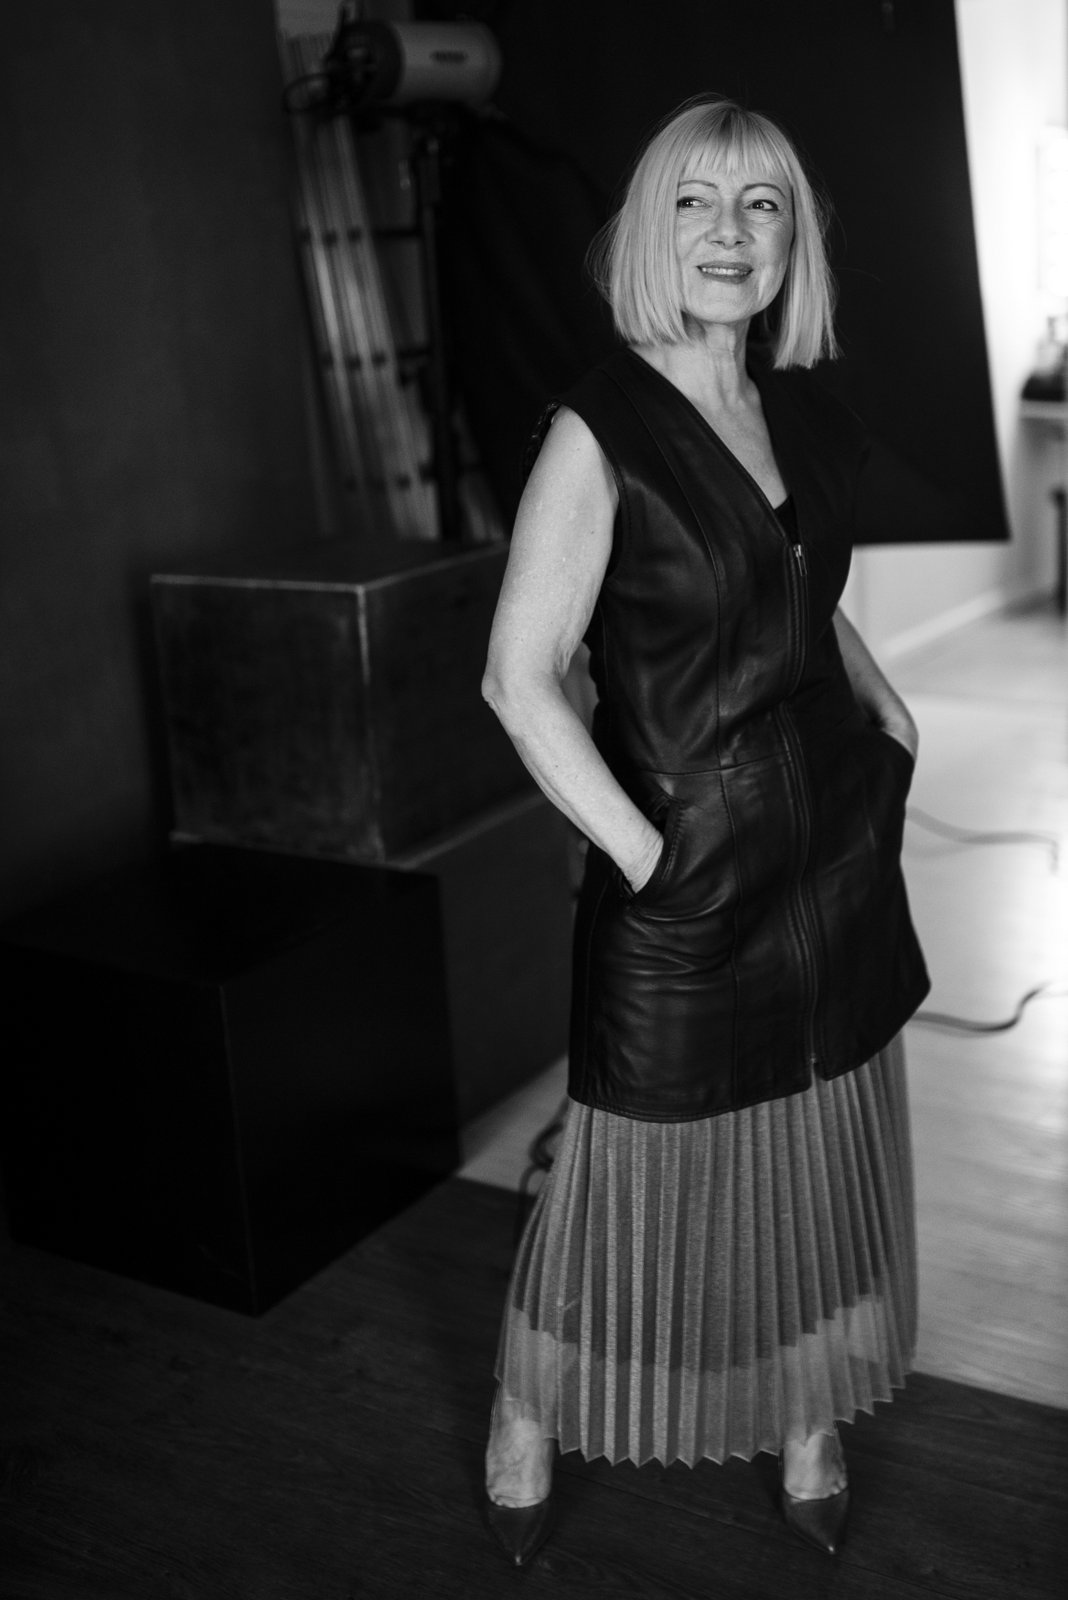 5. kép: Torma Steffi (63)